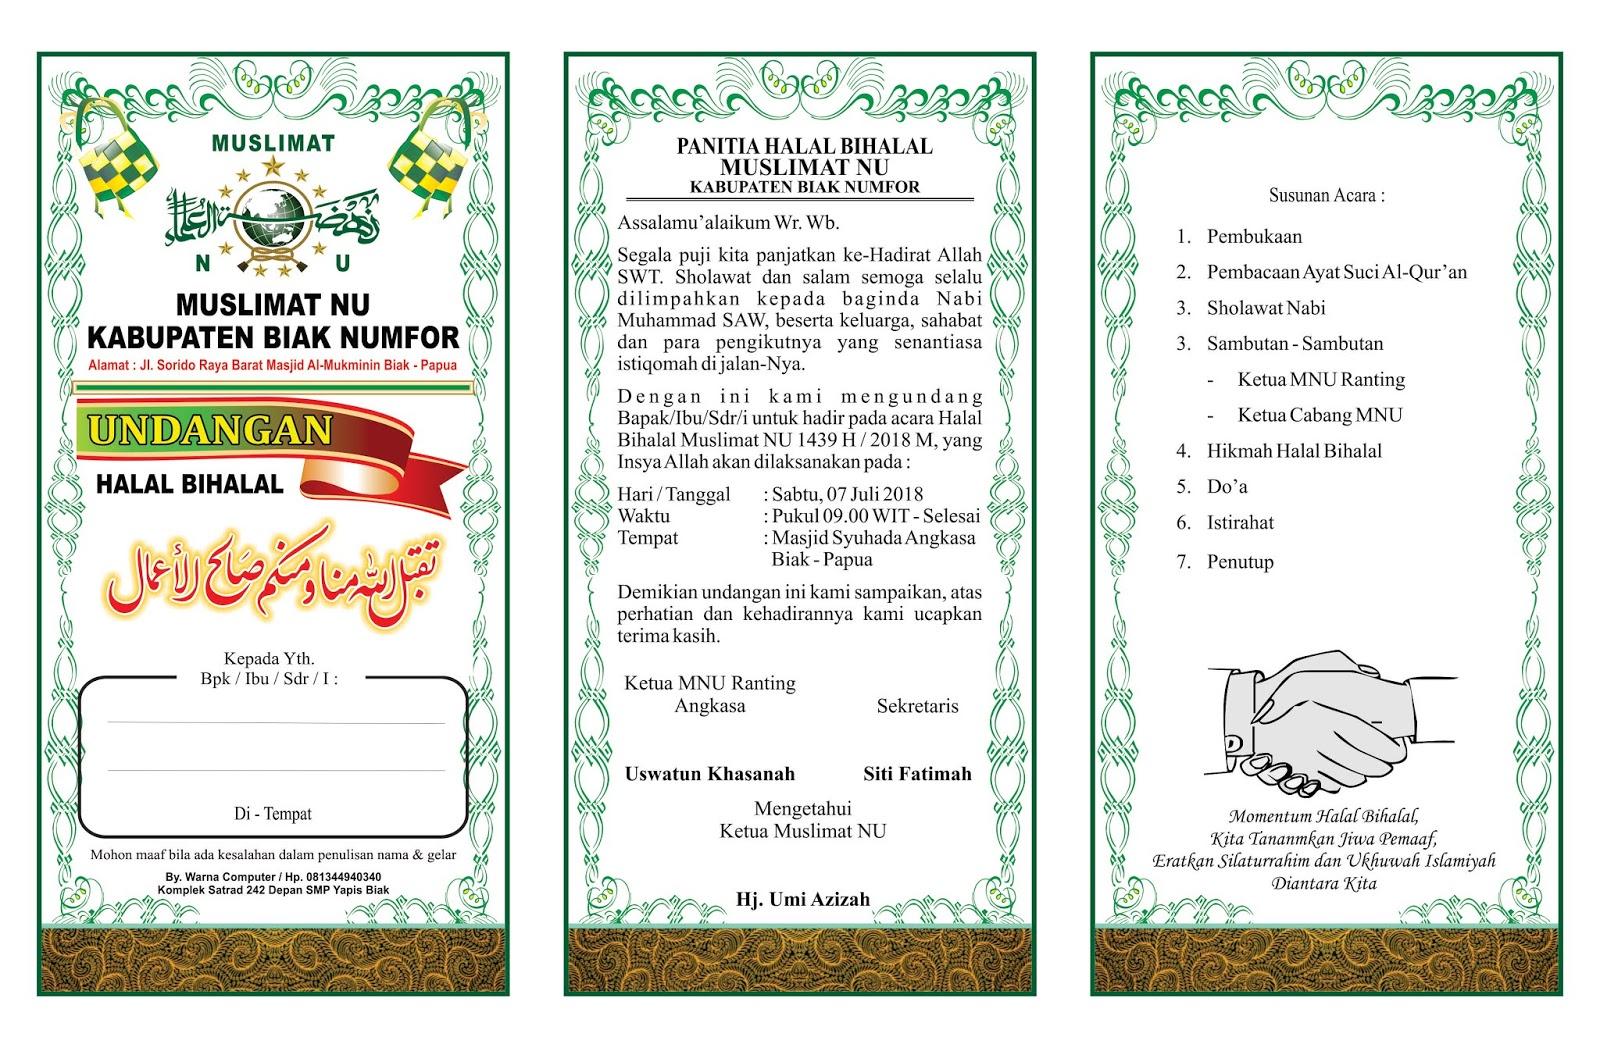 Desain Undangan Halal Bihalal Cdr Inspirasi Pernikahan